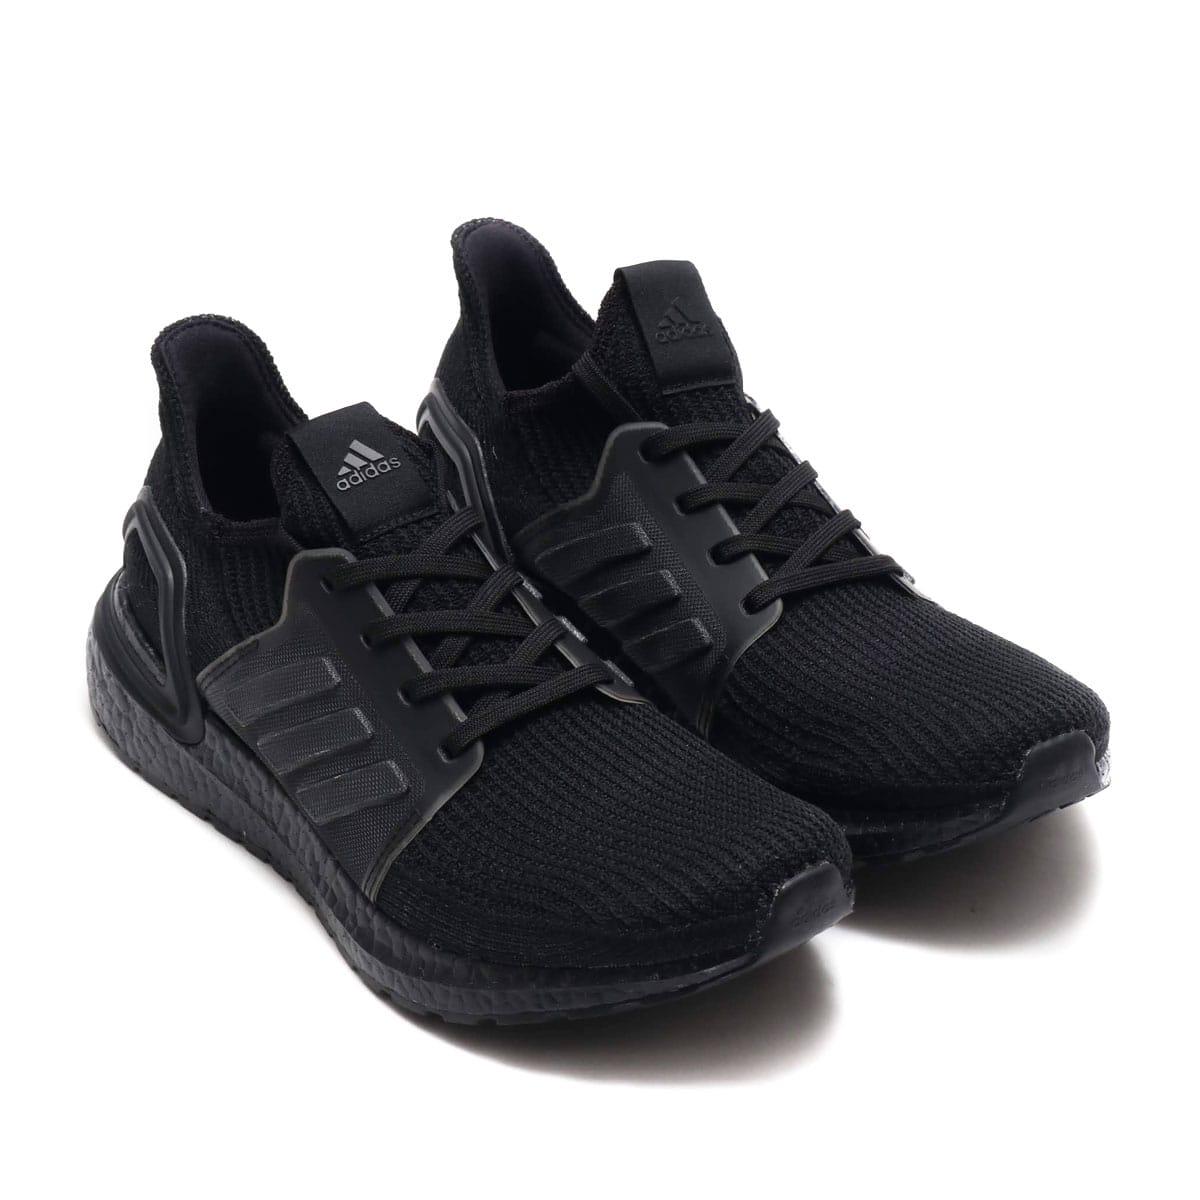 adidas UltraBOOST 19 CORE BLACK/CORE BLACK/CORE BLACK 19FW-I_photo_large